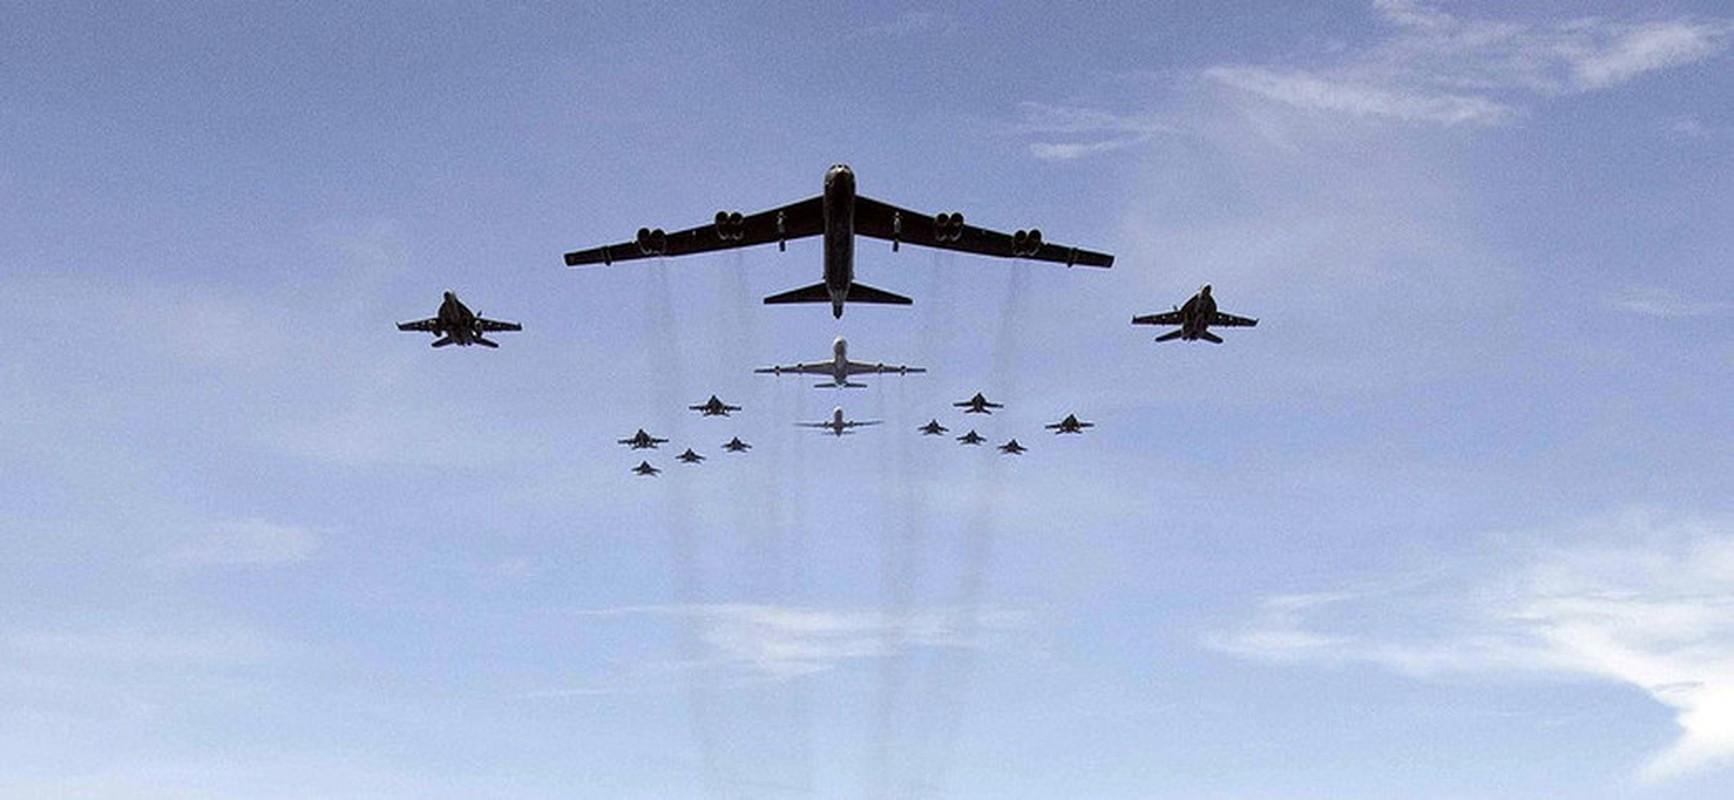 Bien doi B-52 My xam nhap bien Okhotsk, Nga dieu loat tiem kich giam sat-Hinh-22